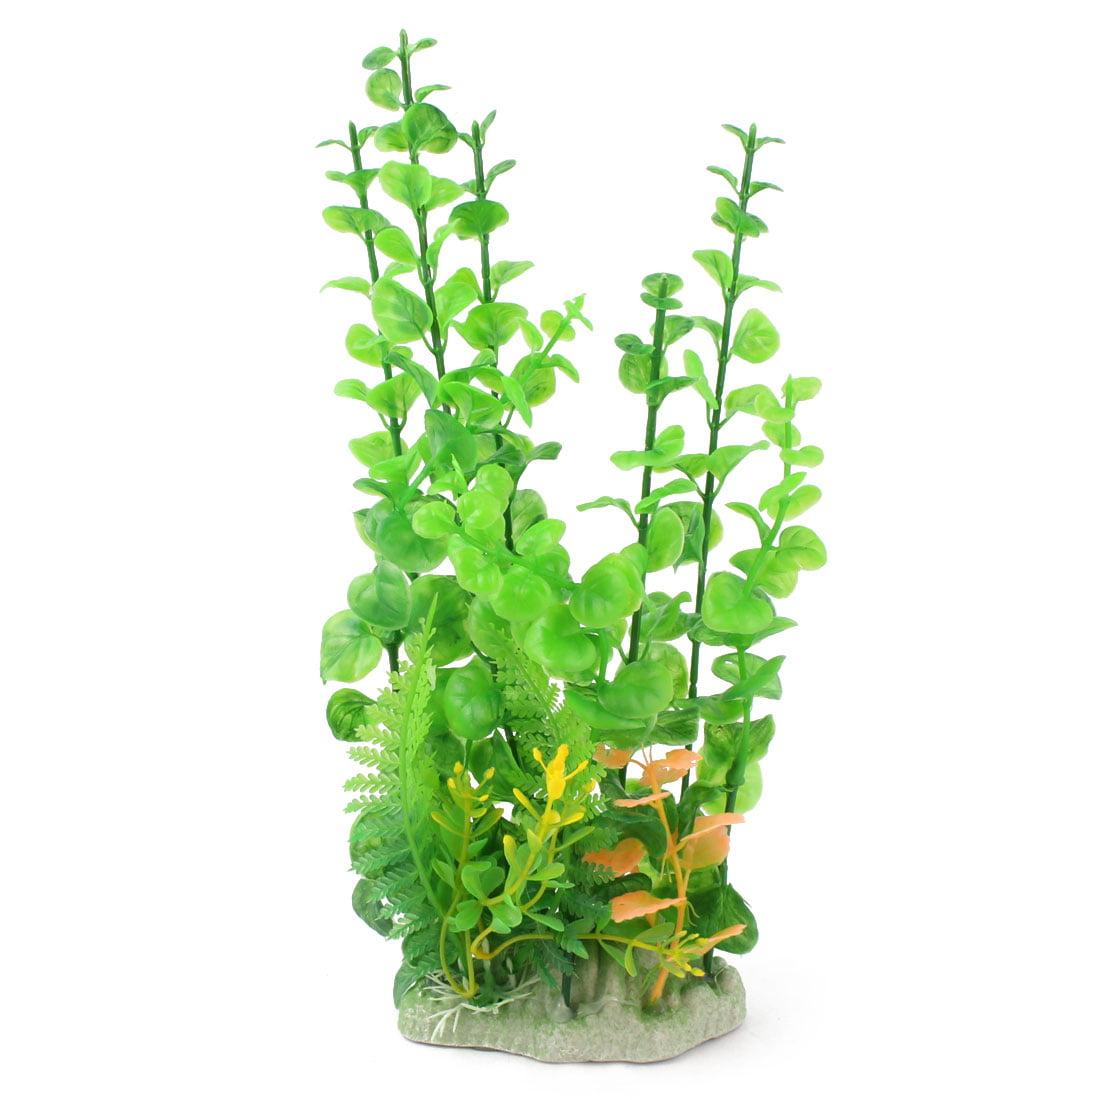 Aquarium Fish Tank Plastic Simulation Water Plant Grass Ornament Green Yellow